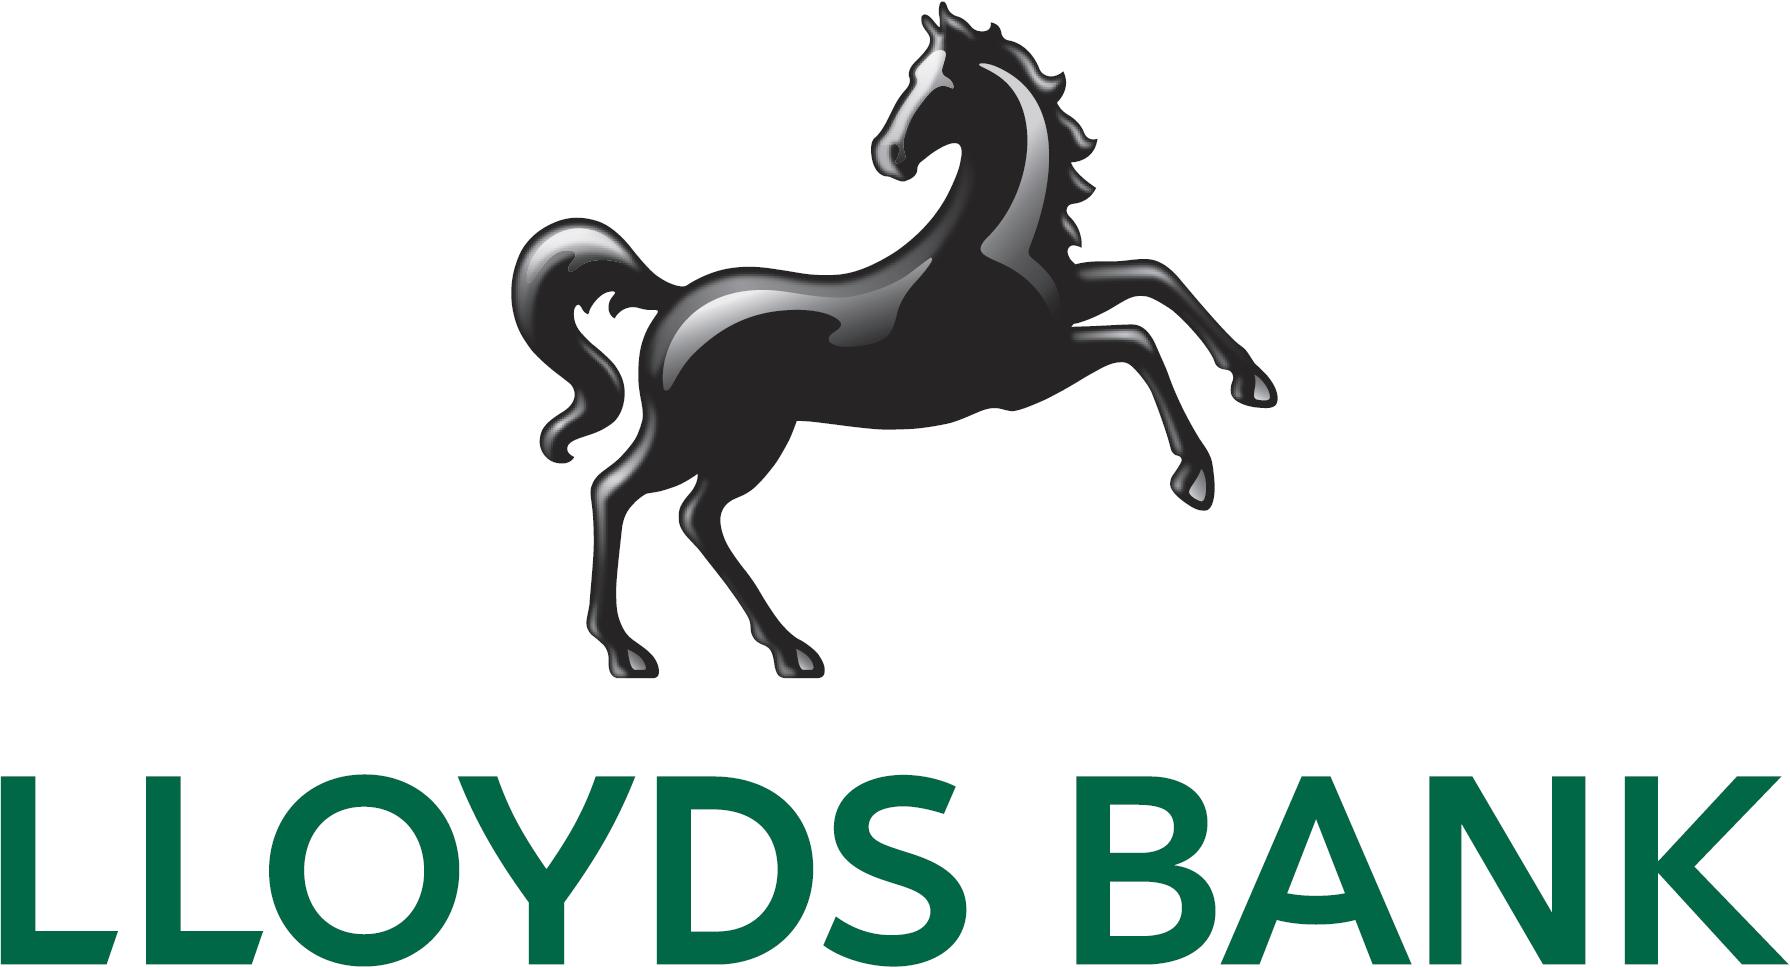 Lloyds Bank schrapt drieduizend banen extra vanwege Brexit